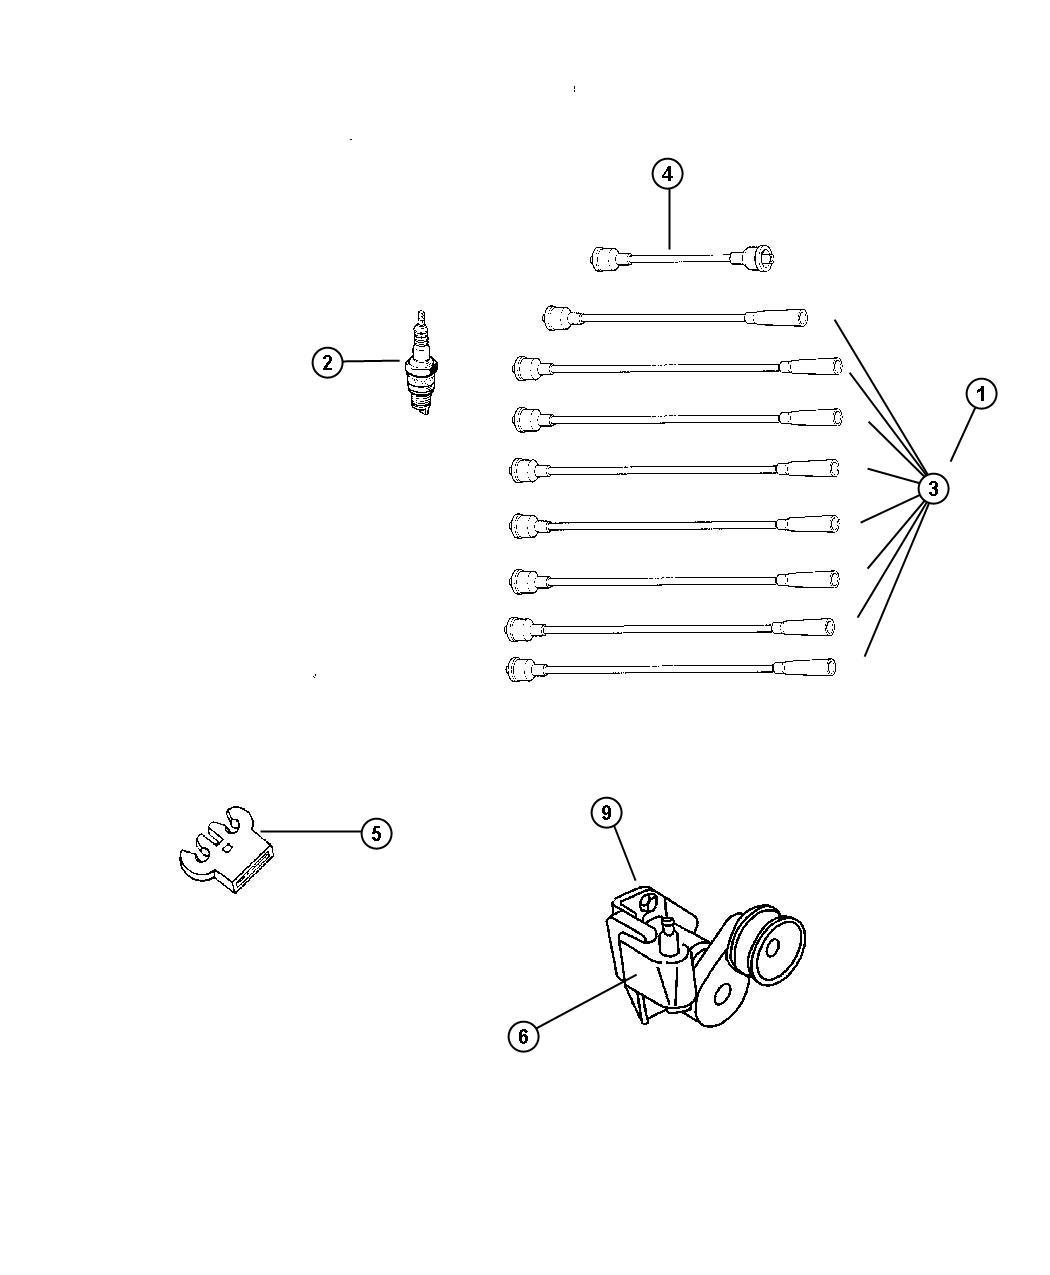 Dodge Challenger Spark Plug Plugs Ignition Engine